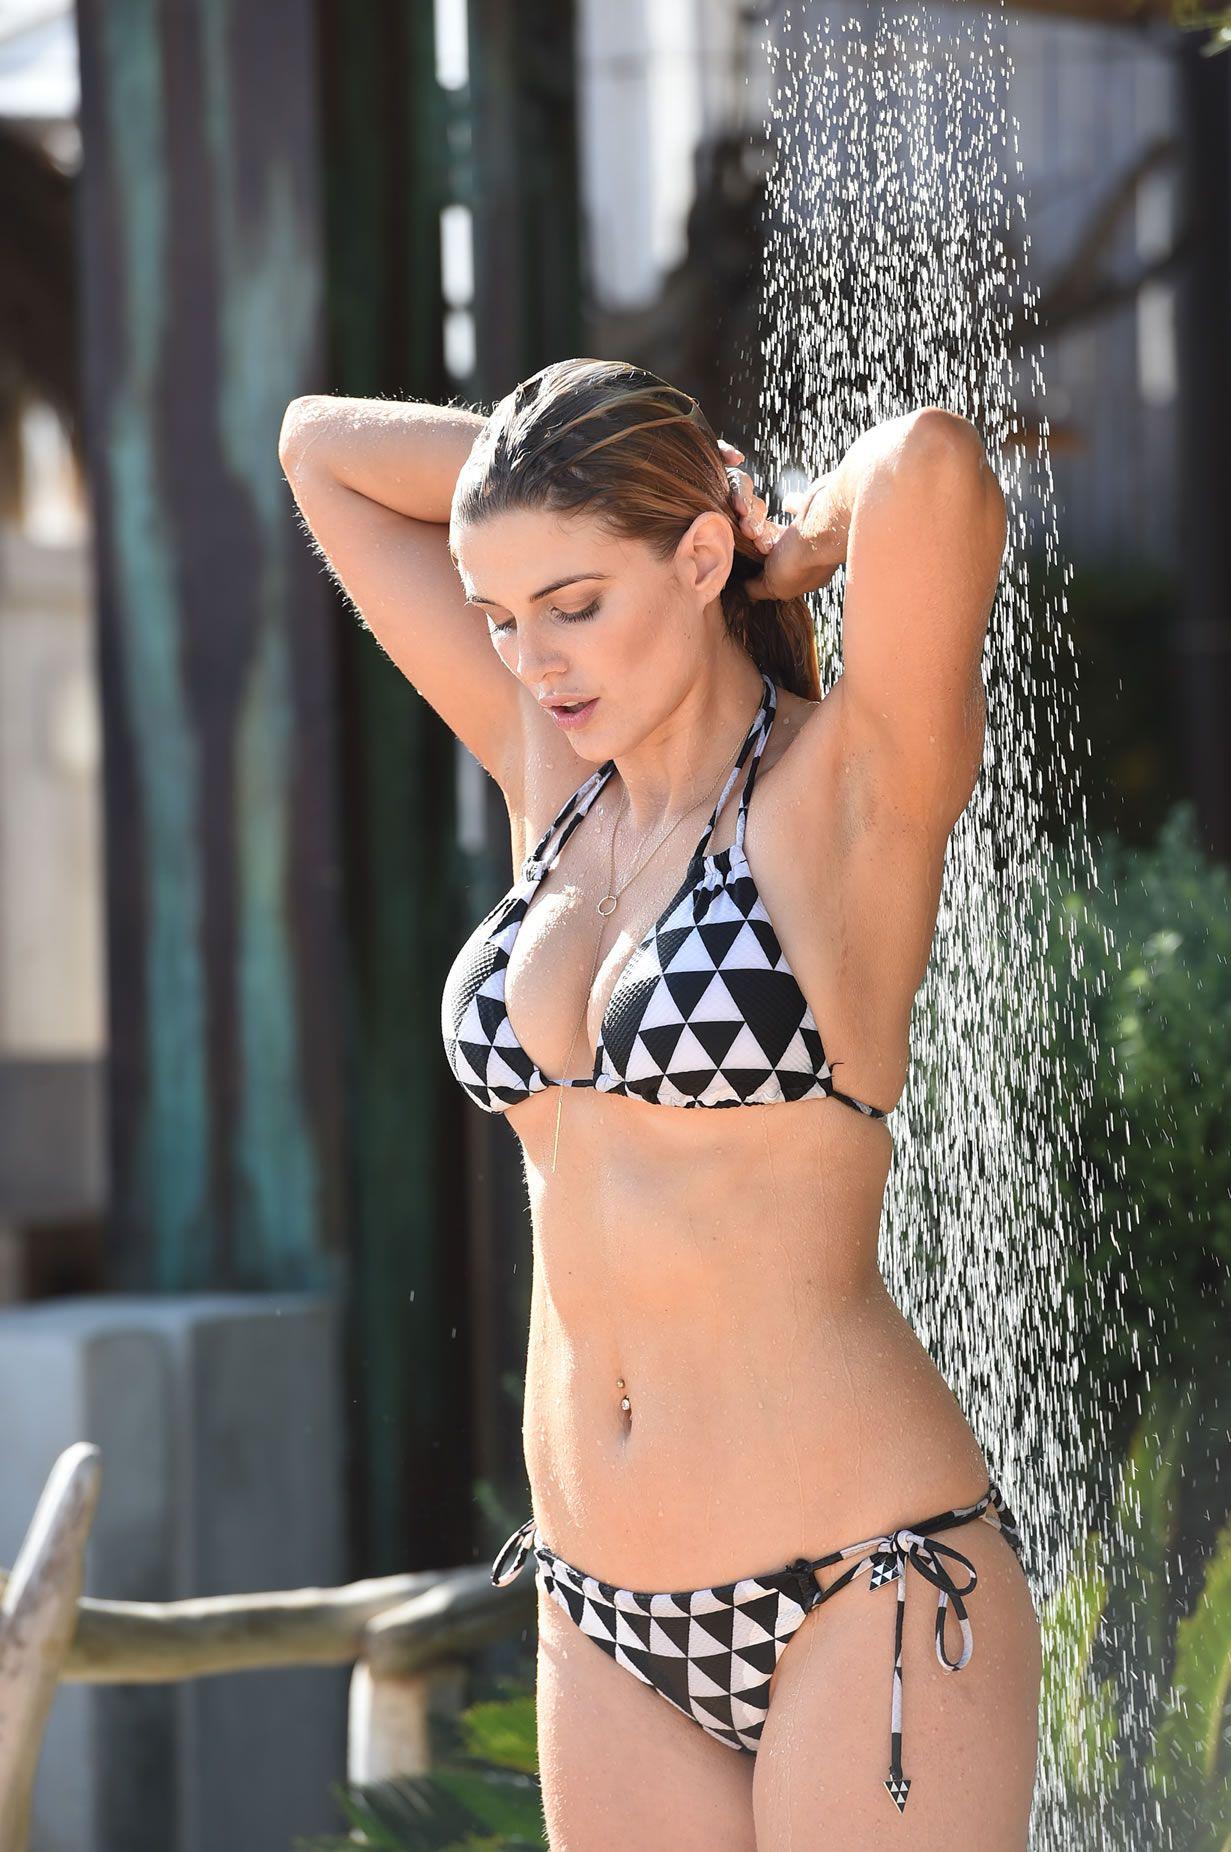 videos Sexy photoshop